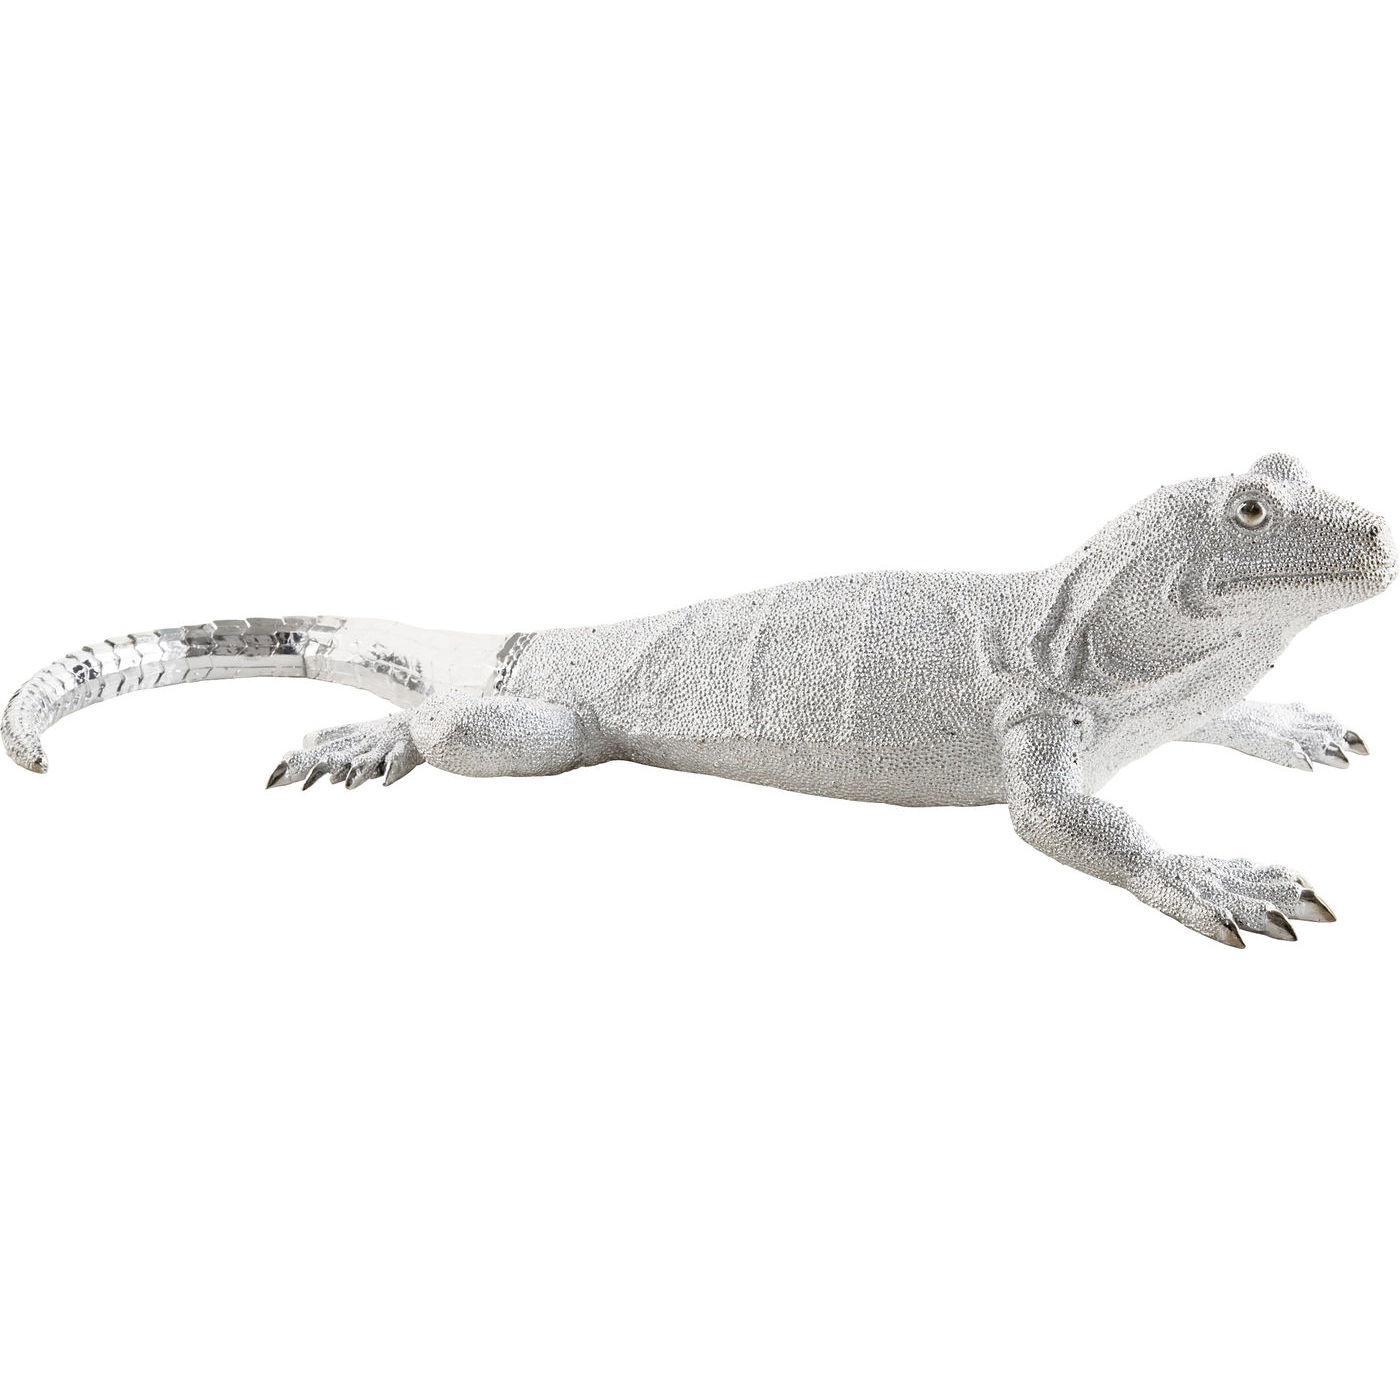 kare design Kare design skulptur, lizard silver deluxe - sølv polyresin, (24x101cm) på boboonline.dk